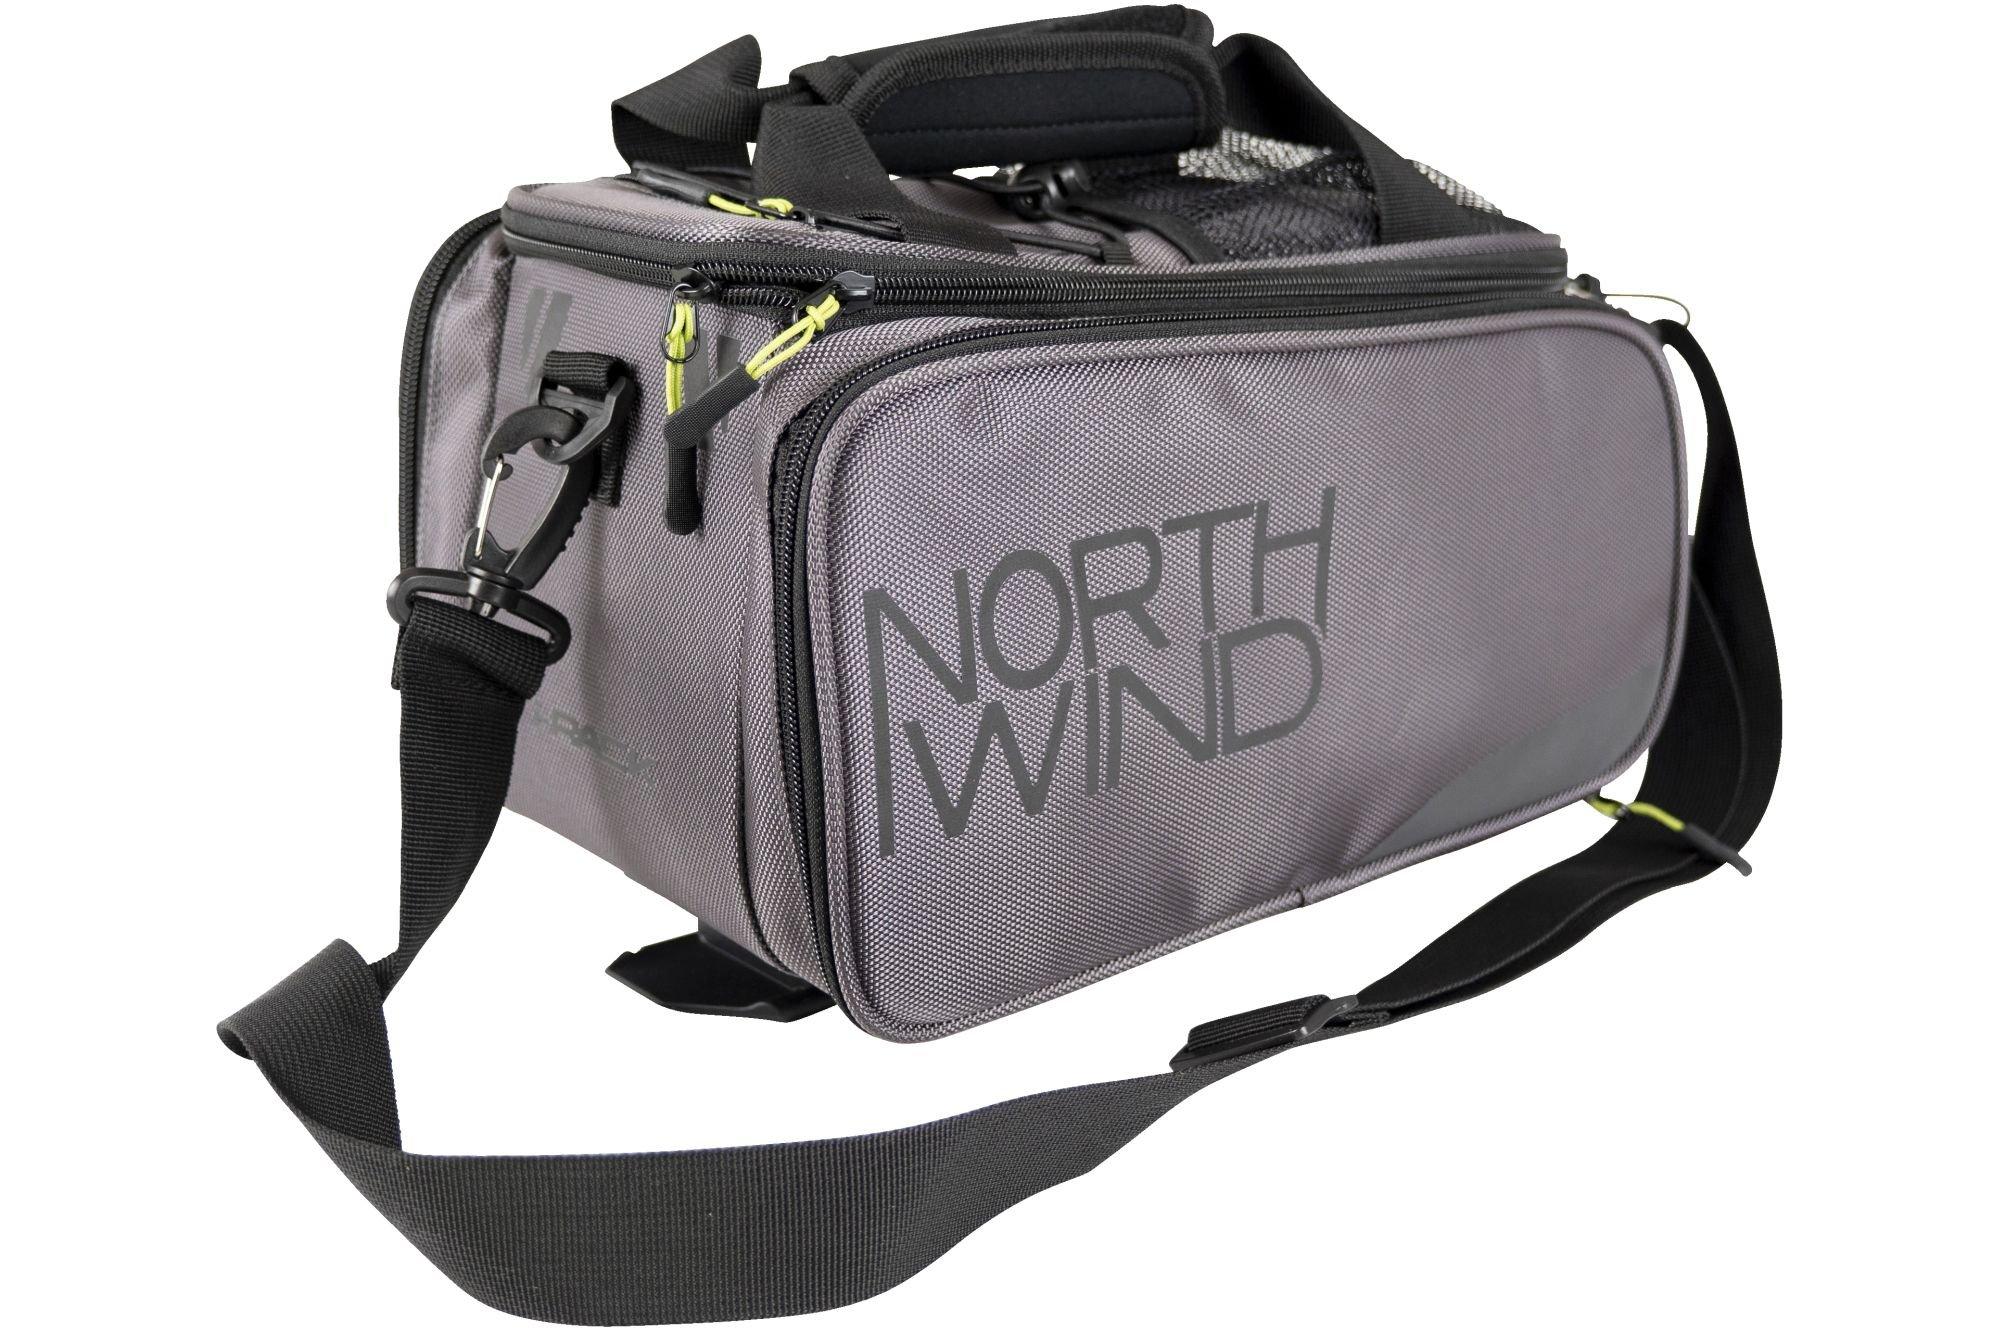 Northwind Gepäckträgertasche Smartbag Touring i-Rack II (grau/lime)